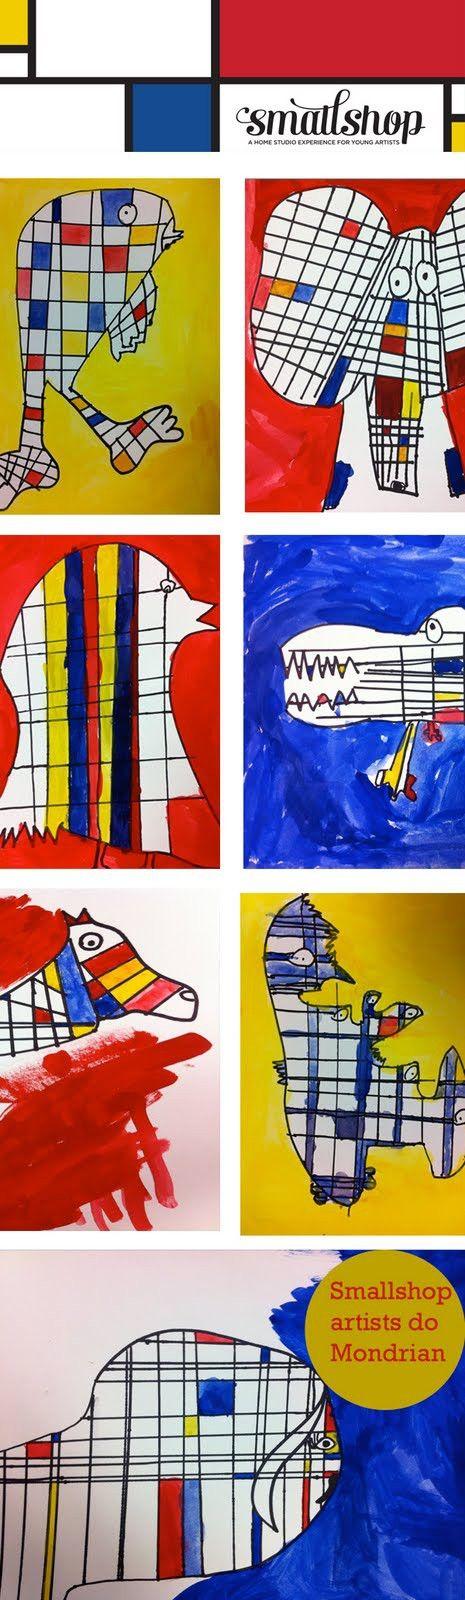 Mondrian with animals www.rainbowswithinreach.blogspot.com